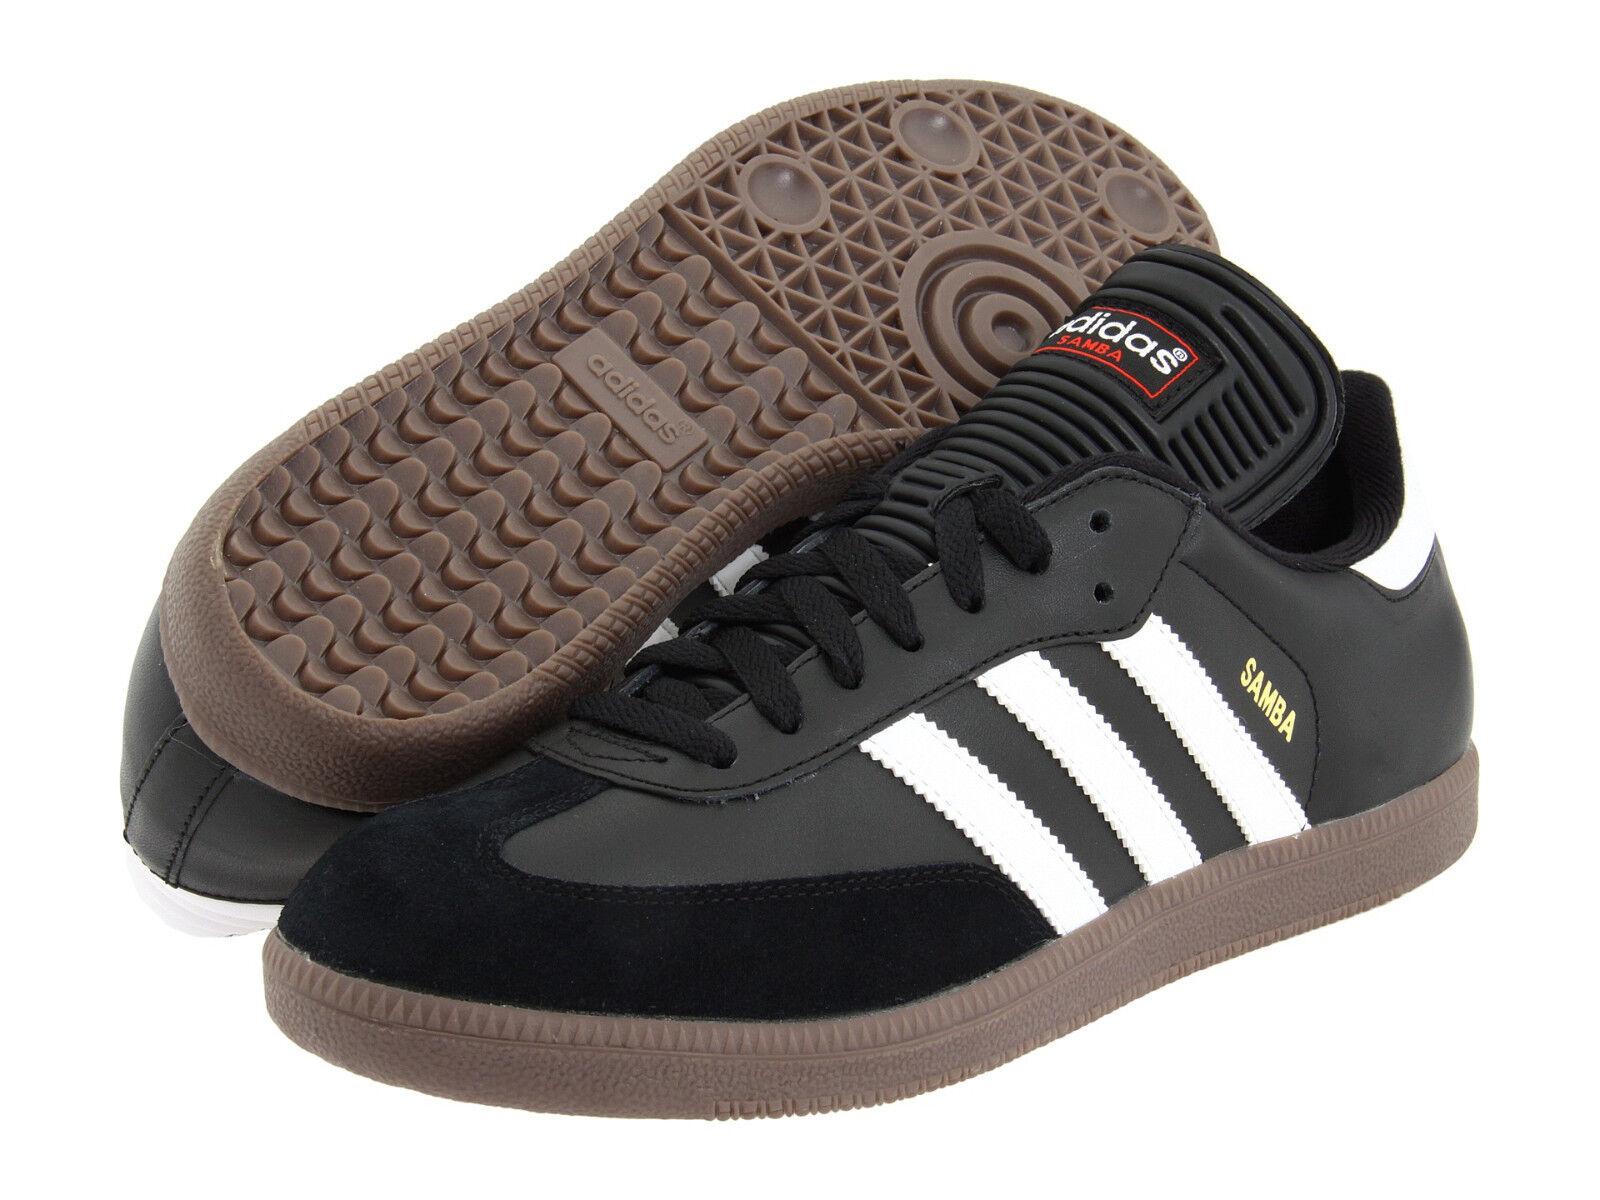 Men's Adidas Samba Classic Black Athletic Indoor Soccer Shoes 034563 Sz 6.5-13.5